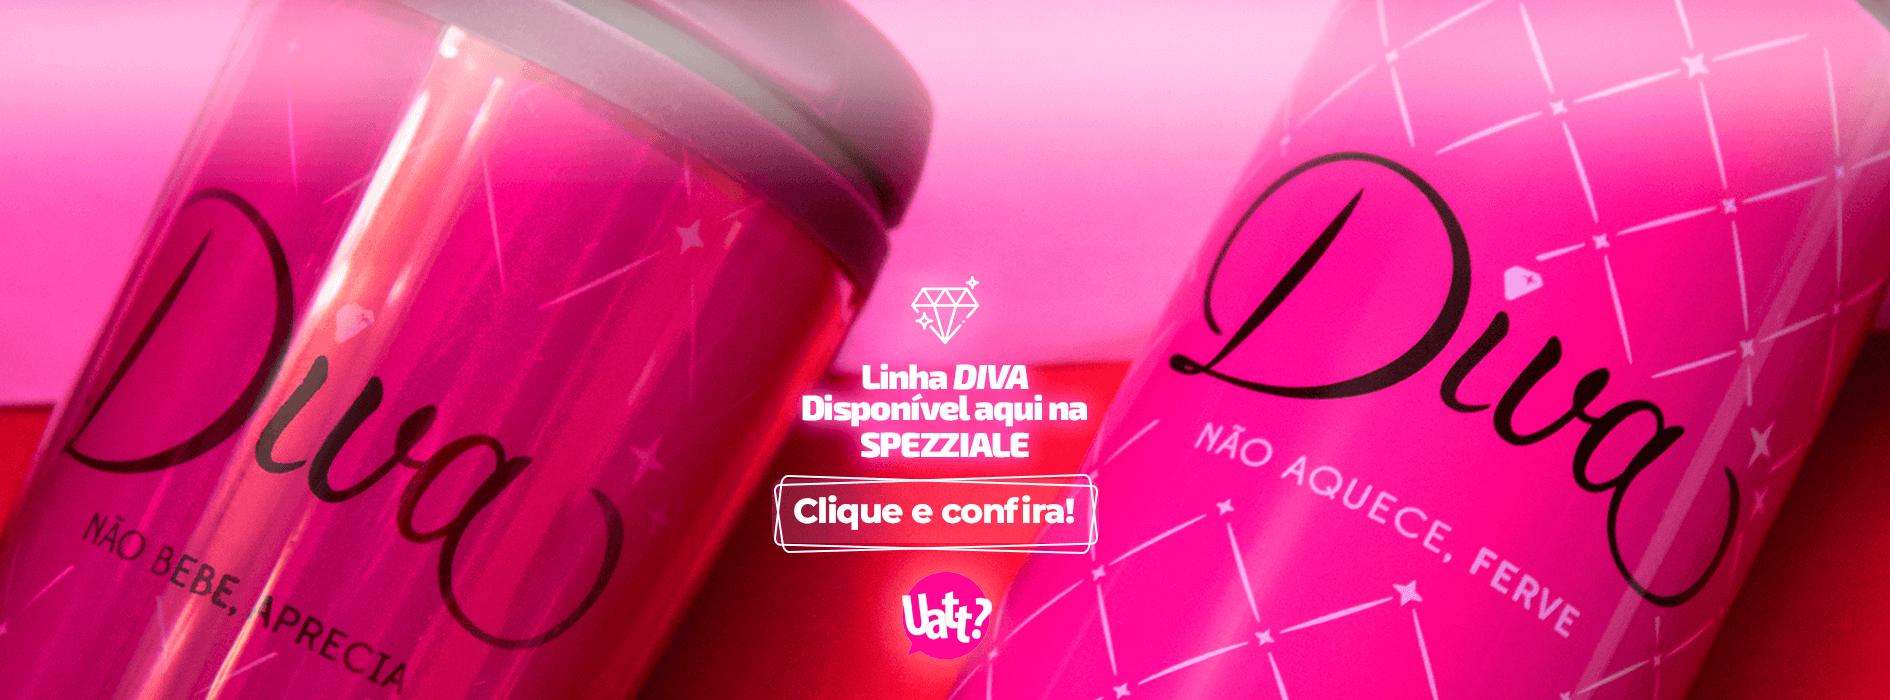 Banner Linha DIVA | BIA